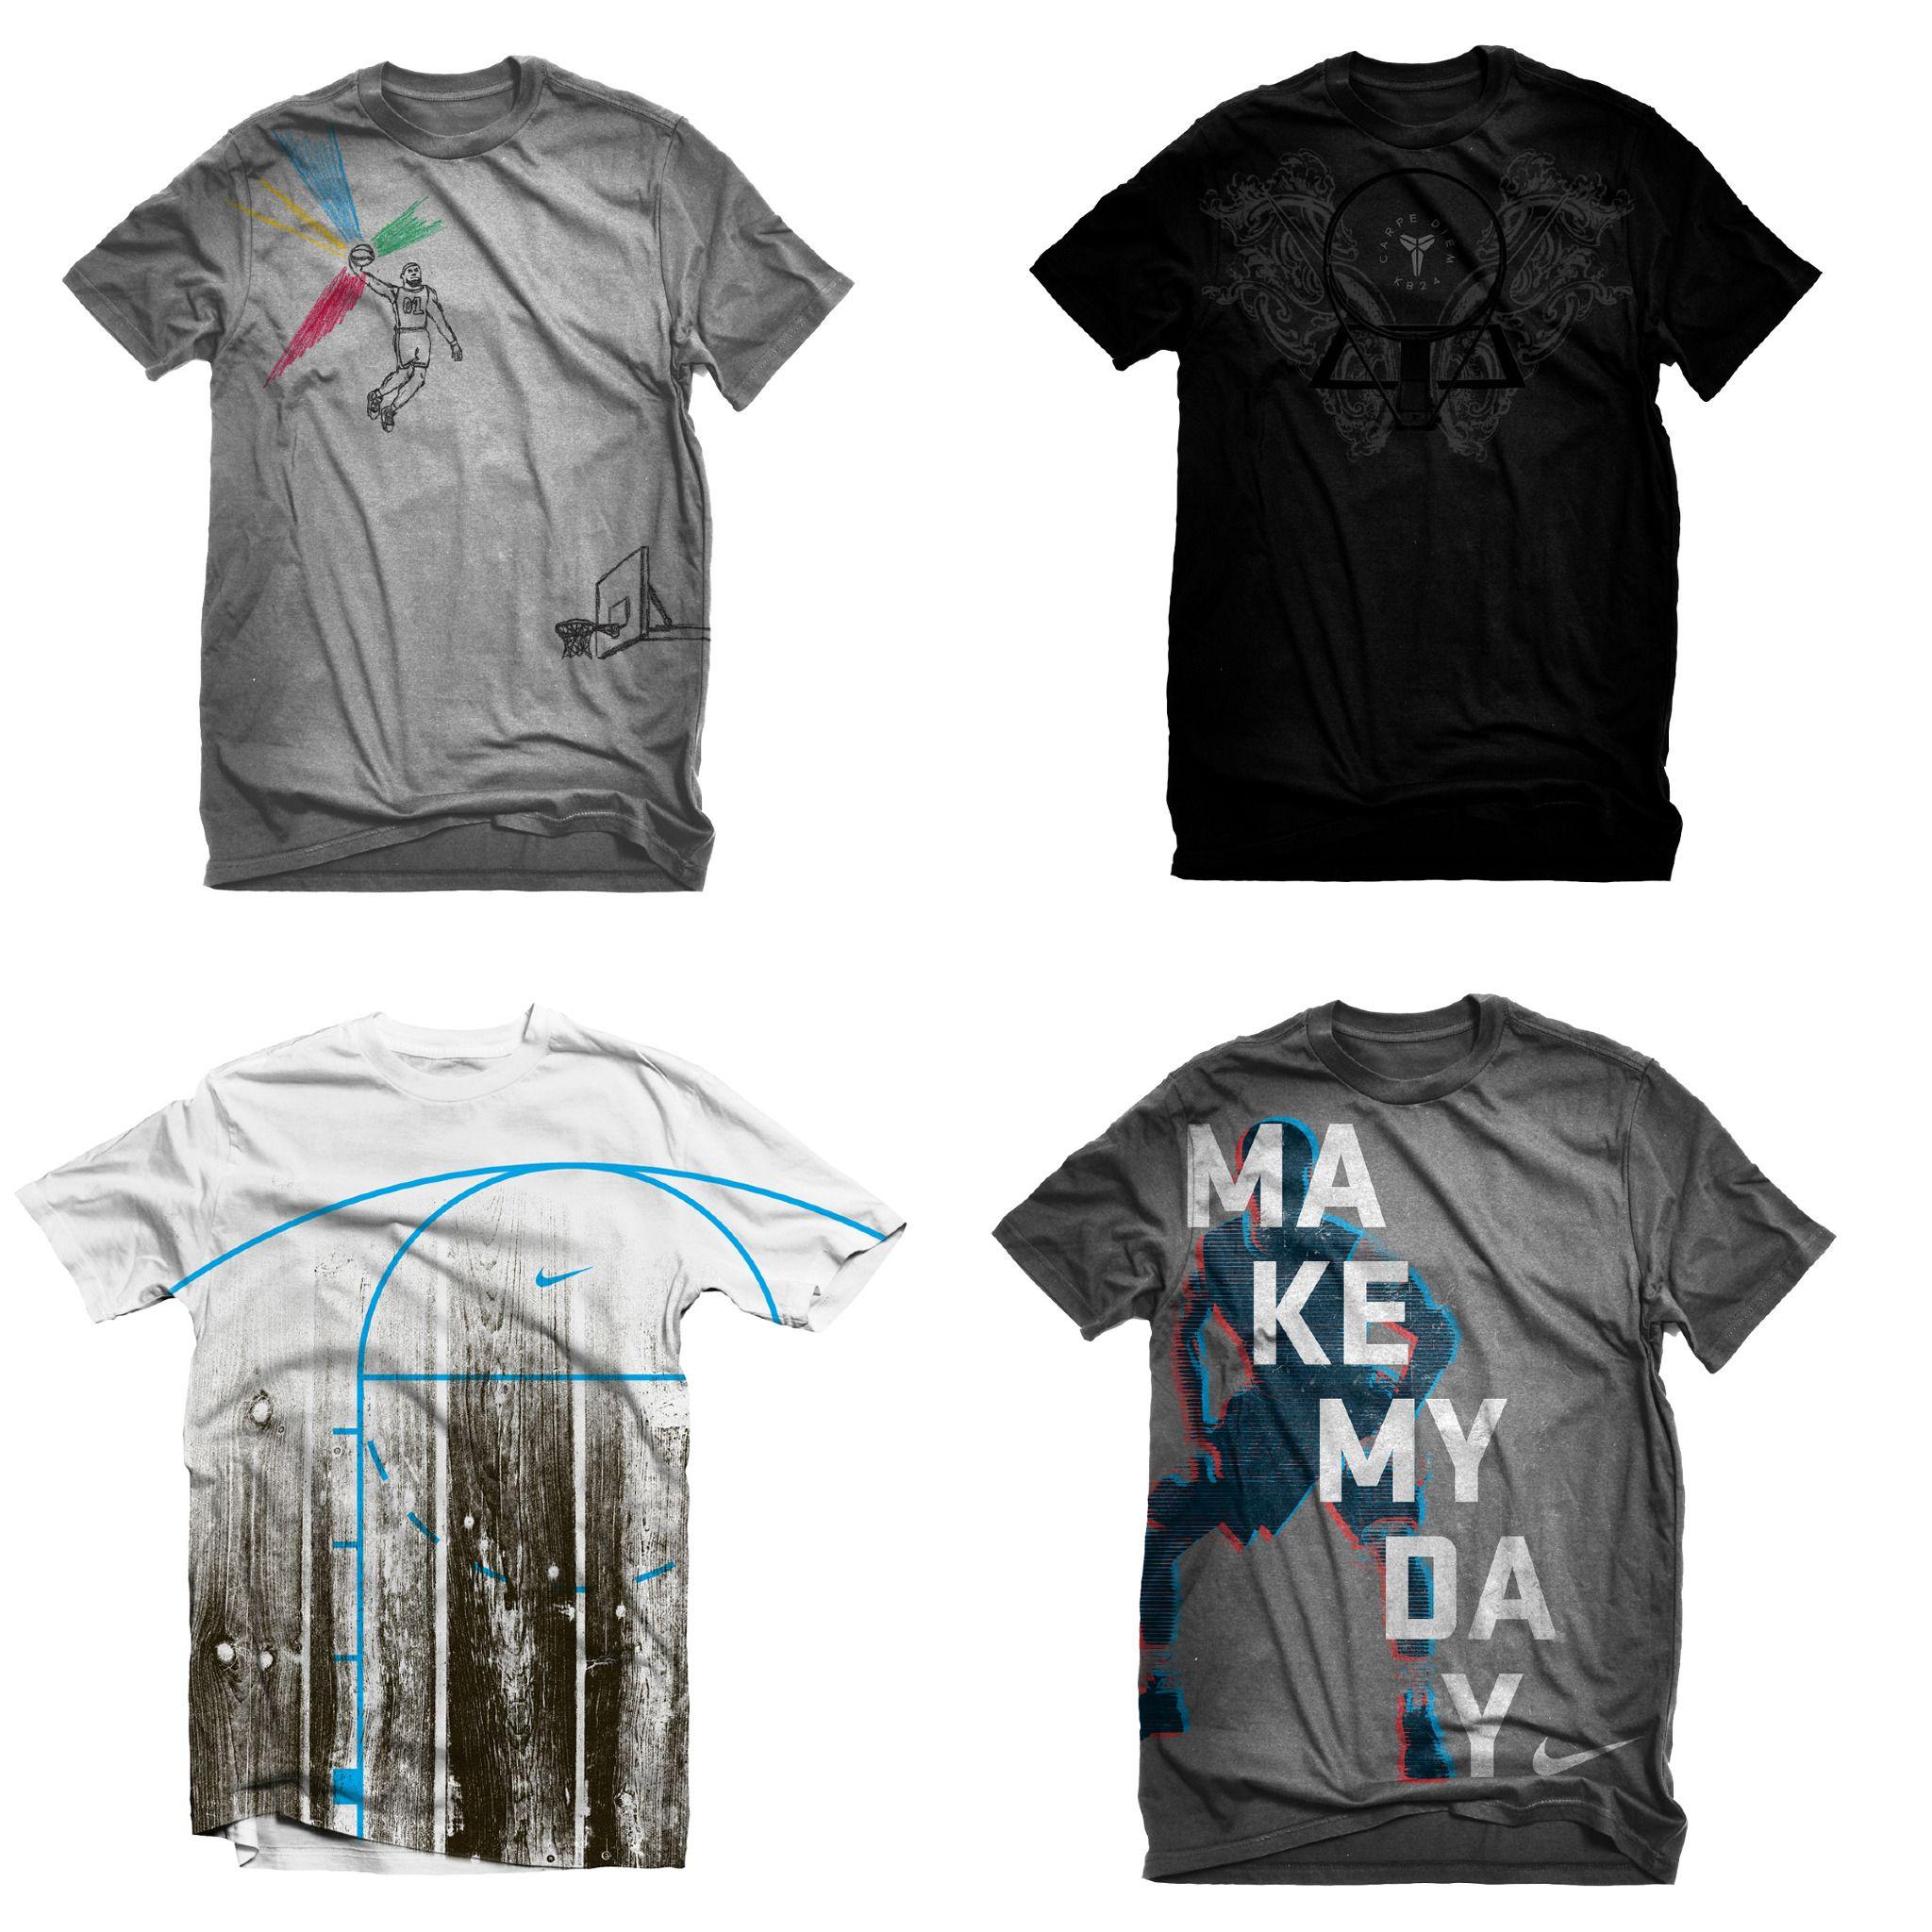 http://www.david-brady.com/Tee-Designs